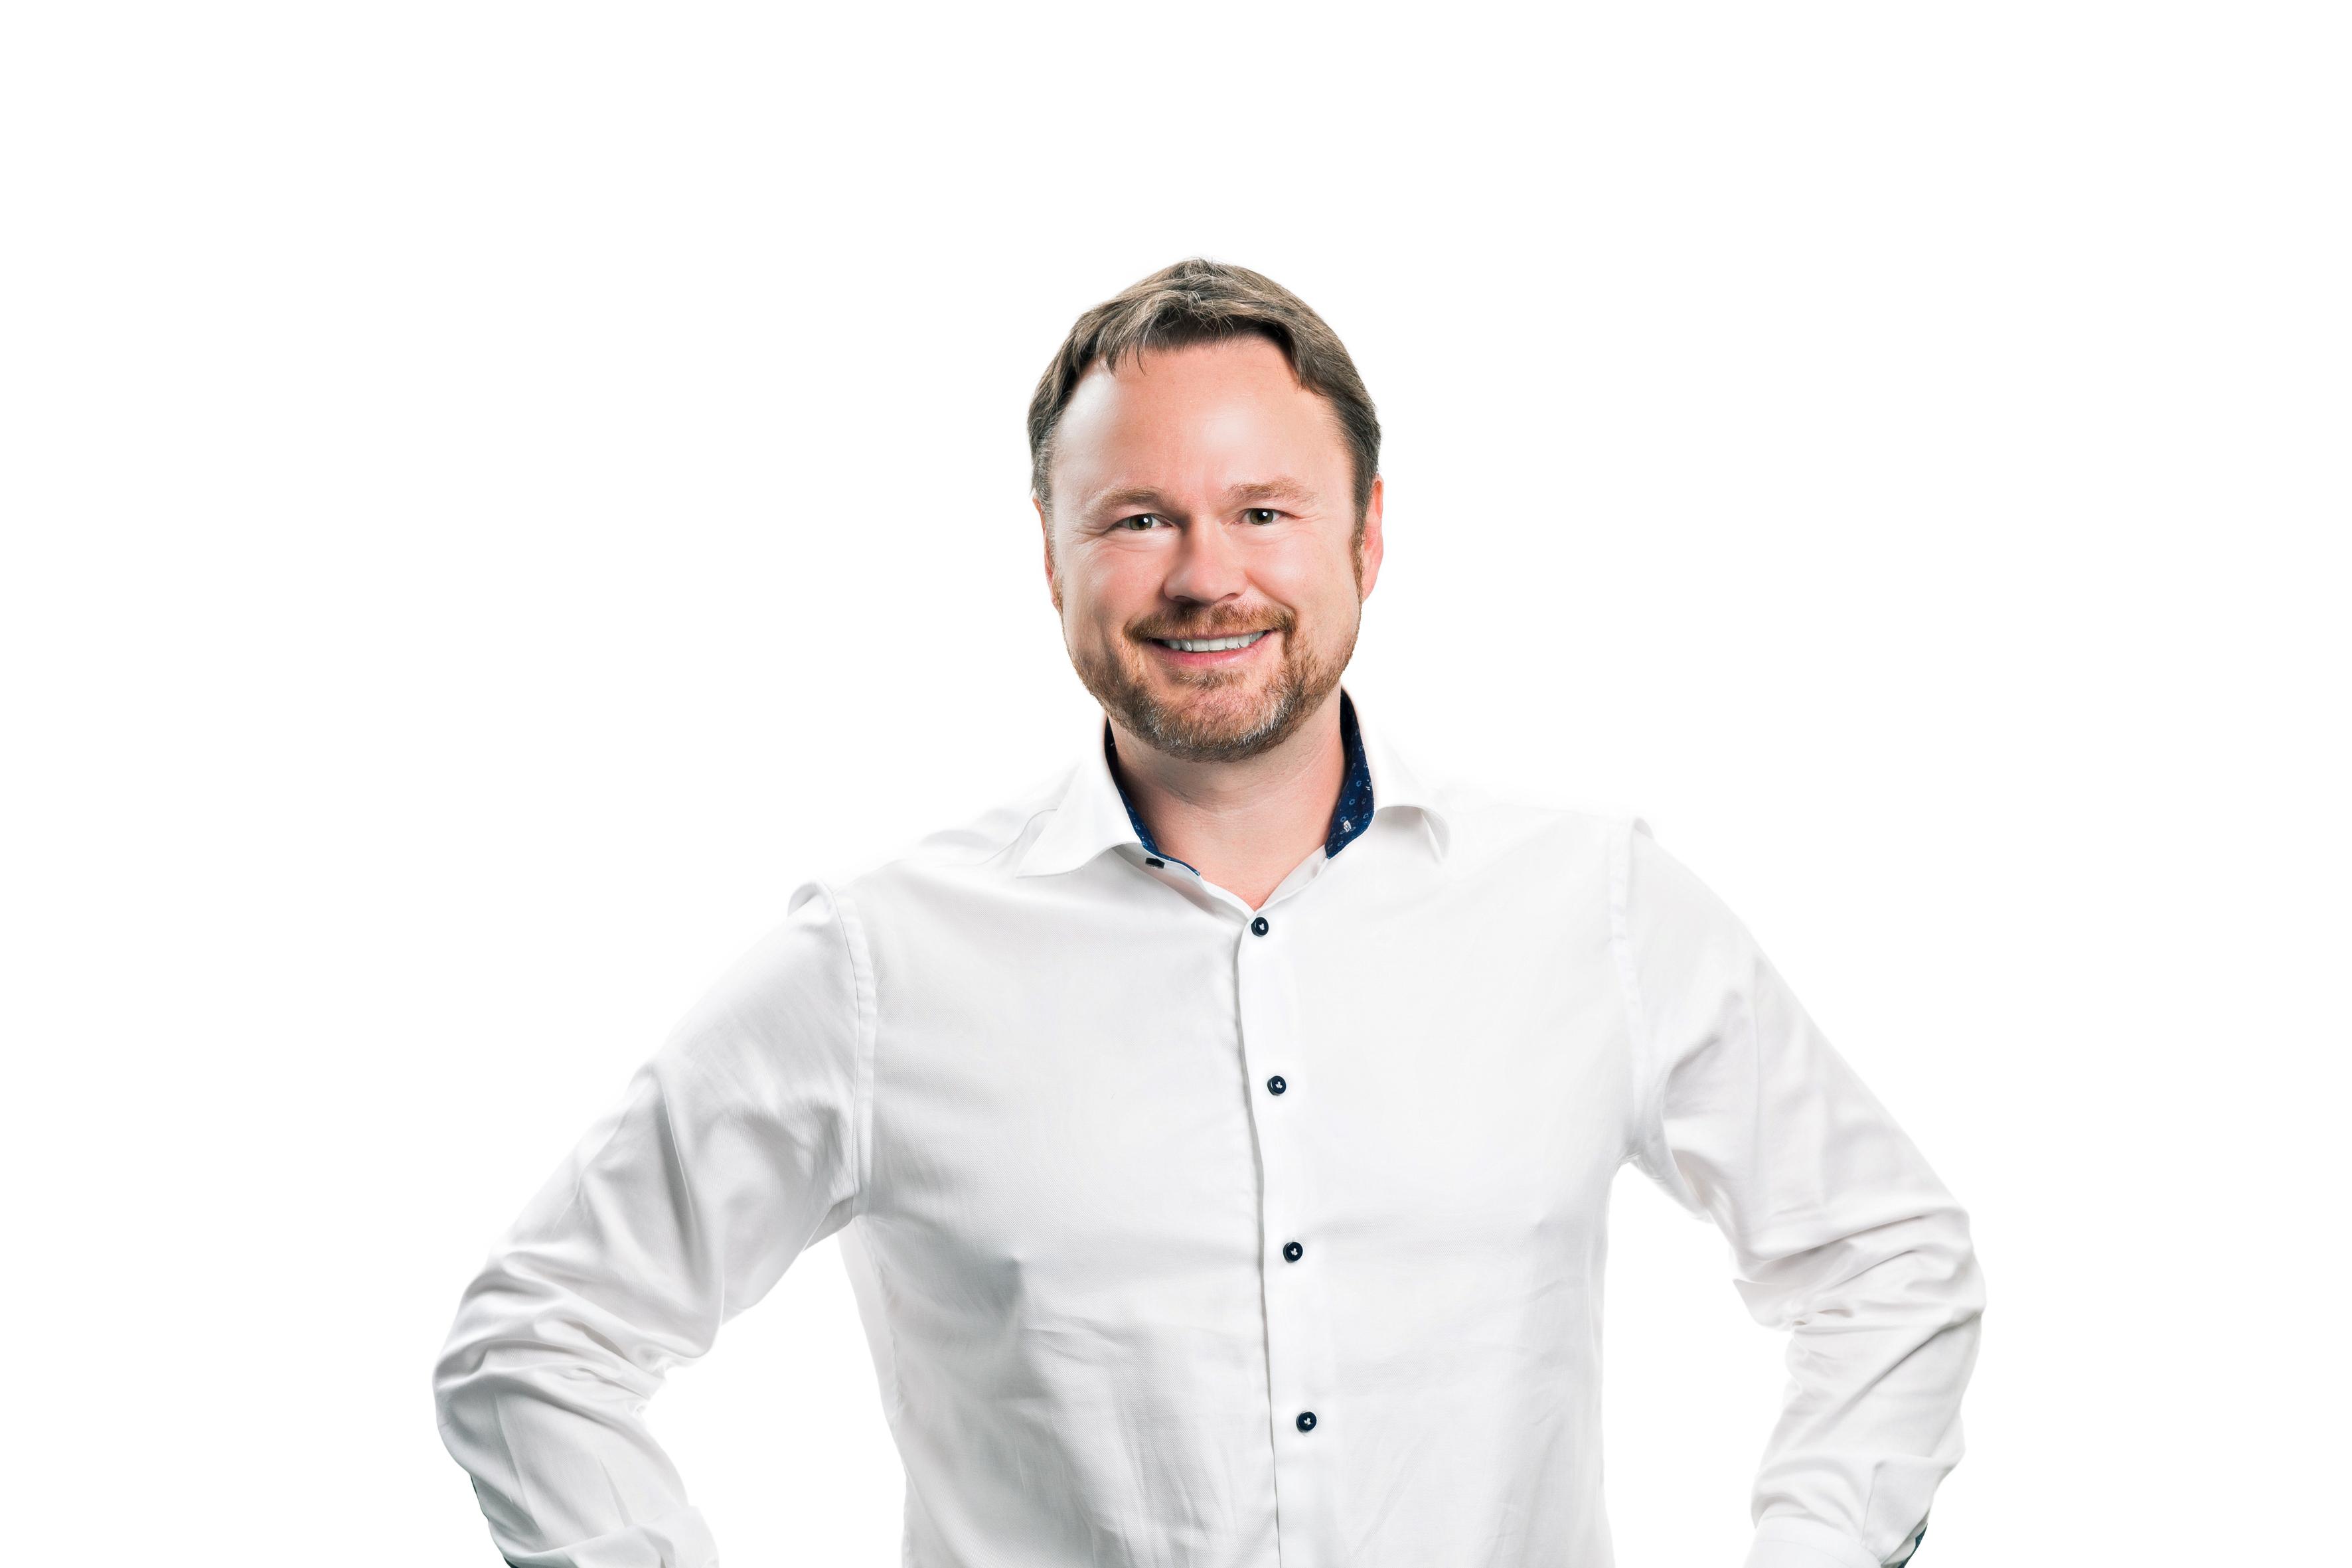 joerg_lamprecht_CEO_dedrone